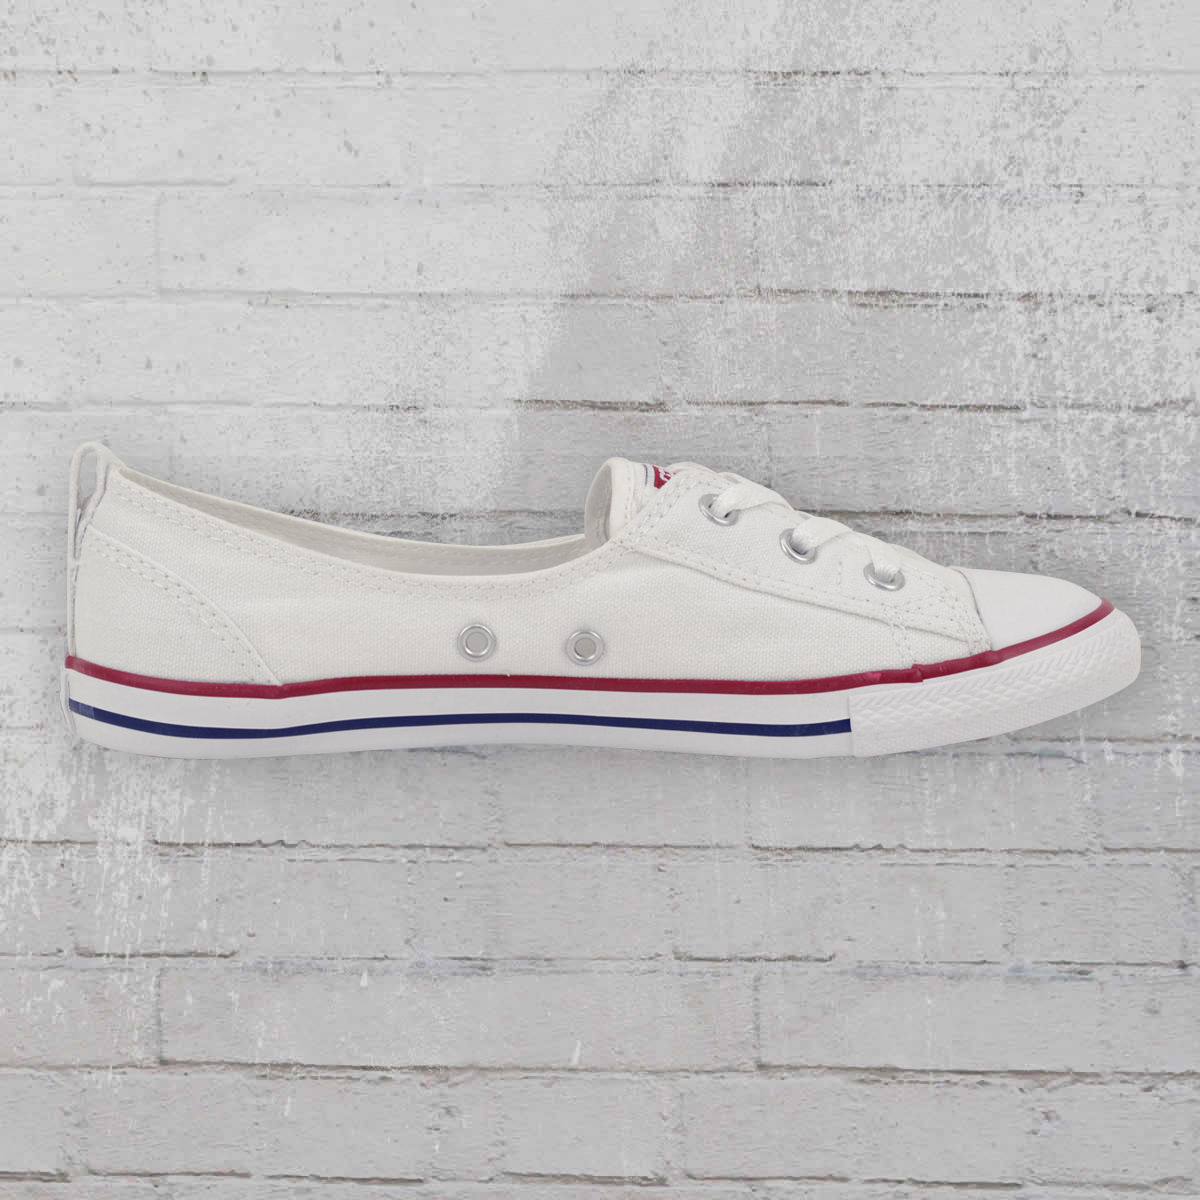 04c156904f56 Converse Leather Chucks AS CT HI 157469 C Shoes bone white 64